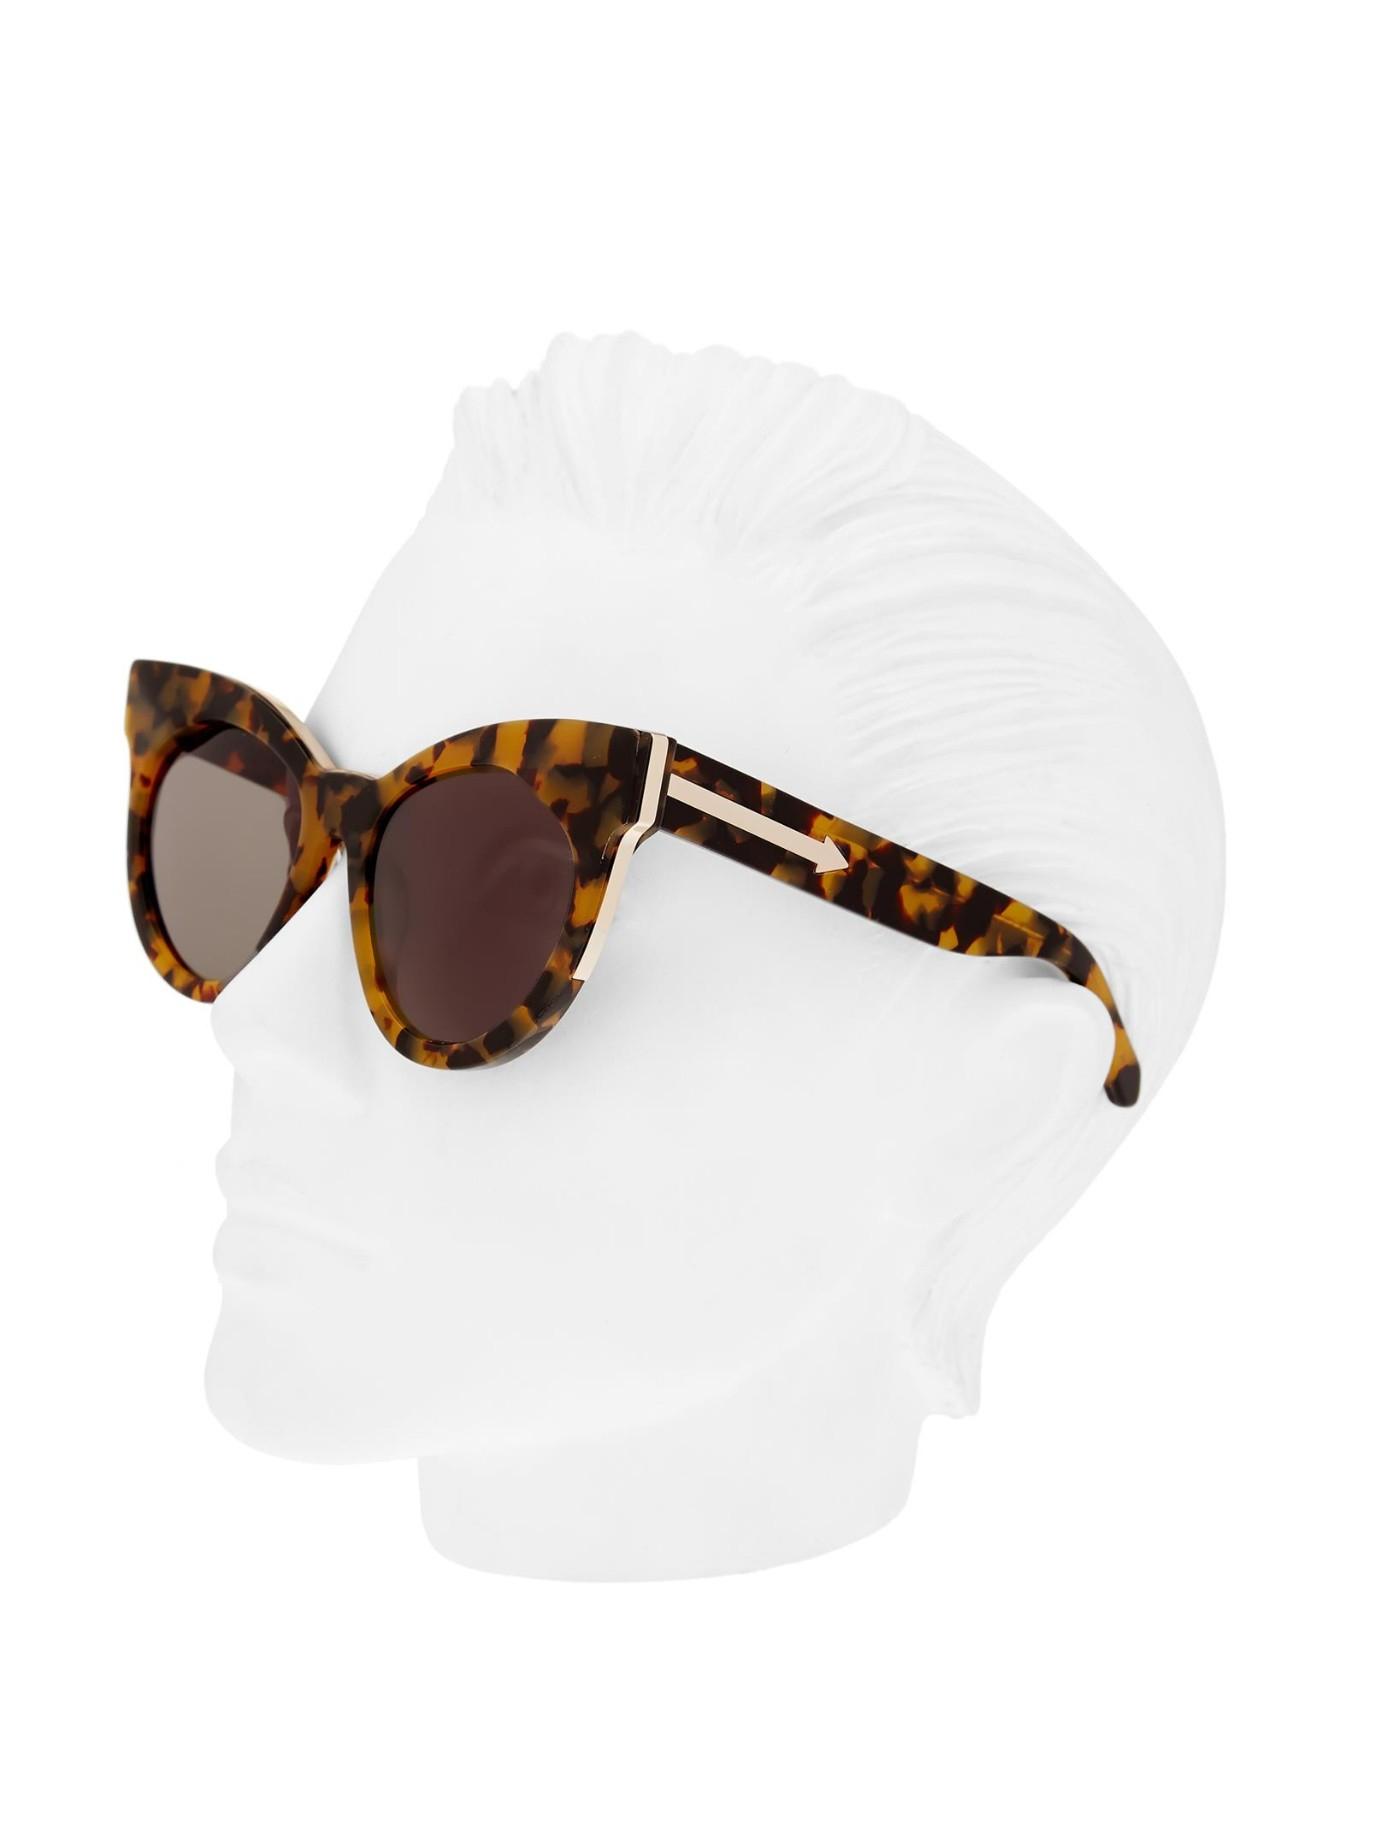 b1b88cc91a3 Lyst - Karen Walker Starburst Cat-eye Frame Sunglasses in Brown